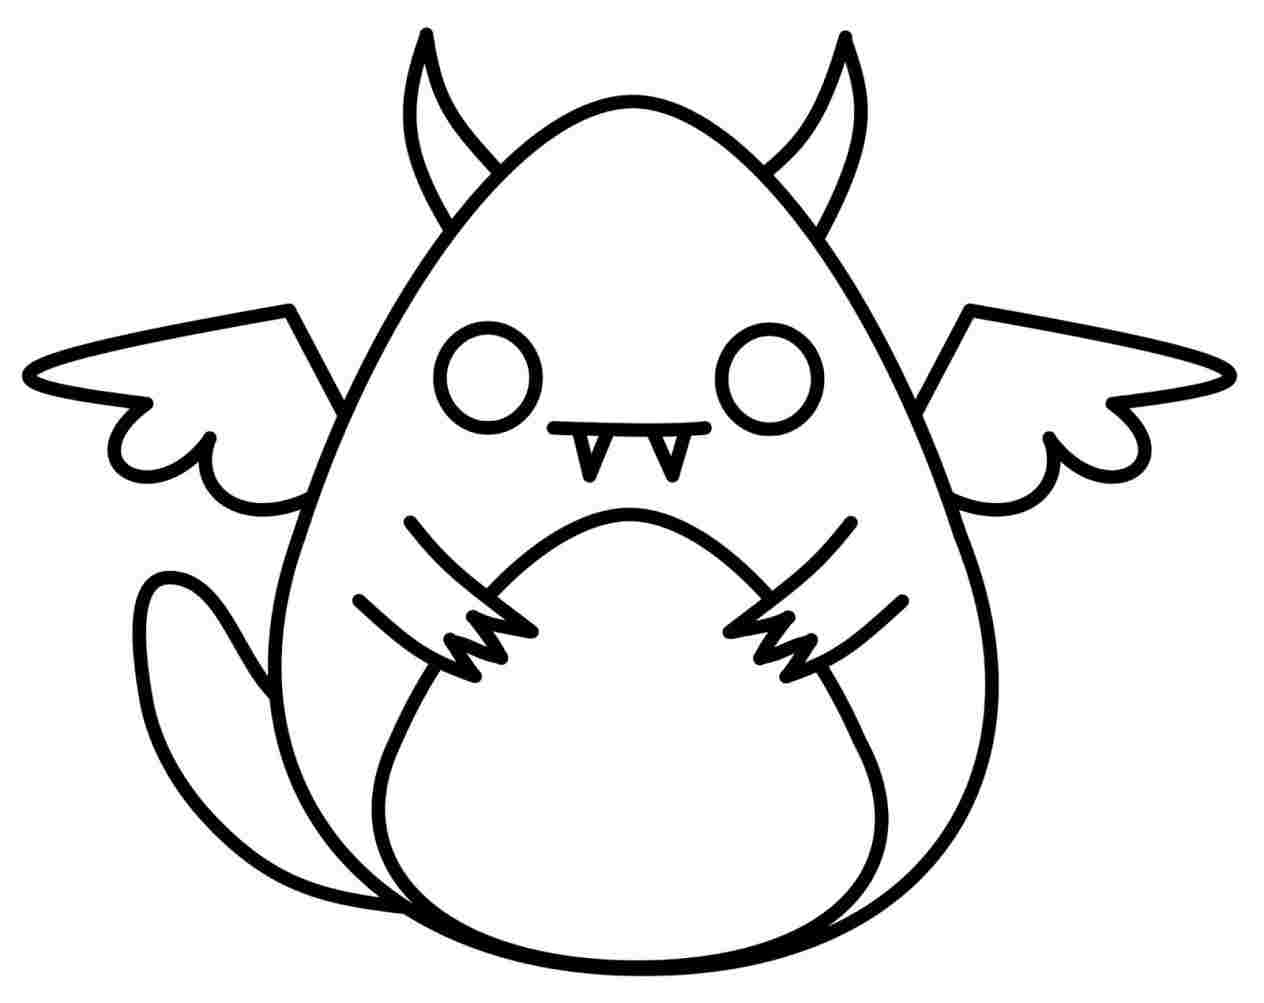 1264x1003 Eye Youtuberhyoutubecom How How To Draw Simple Cute Eyes To Draw